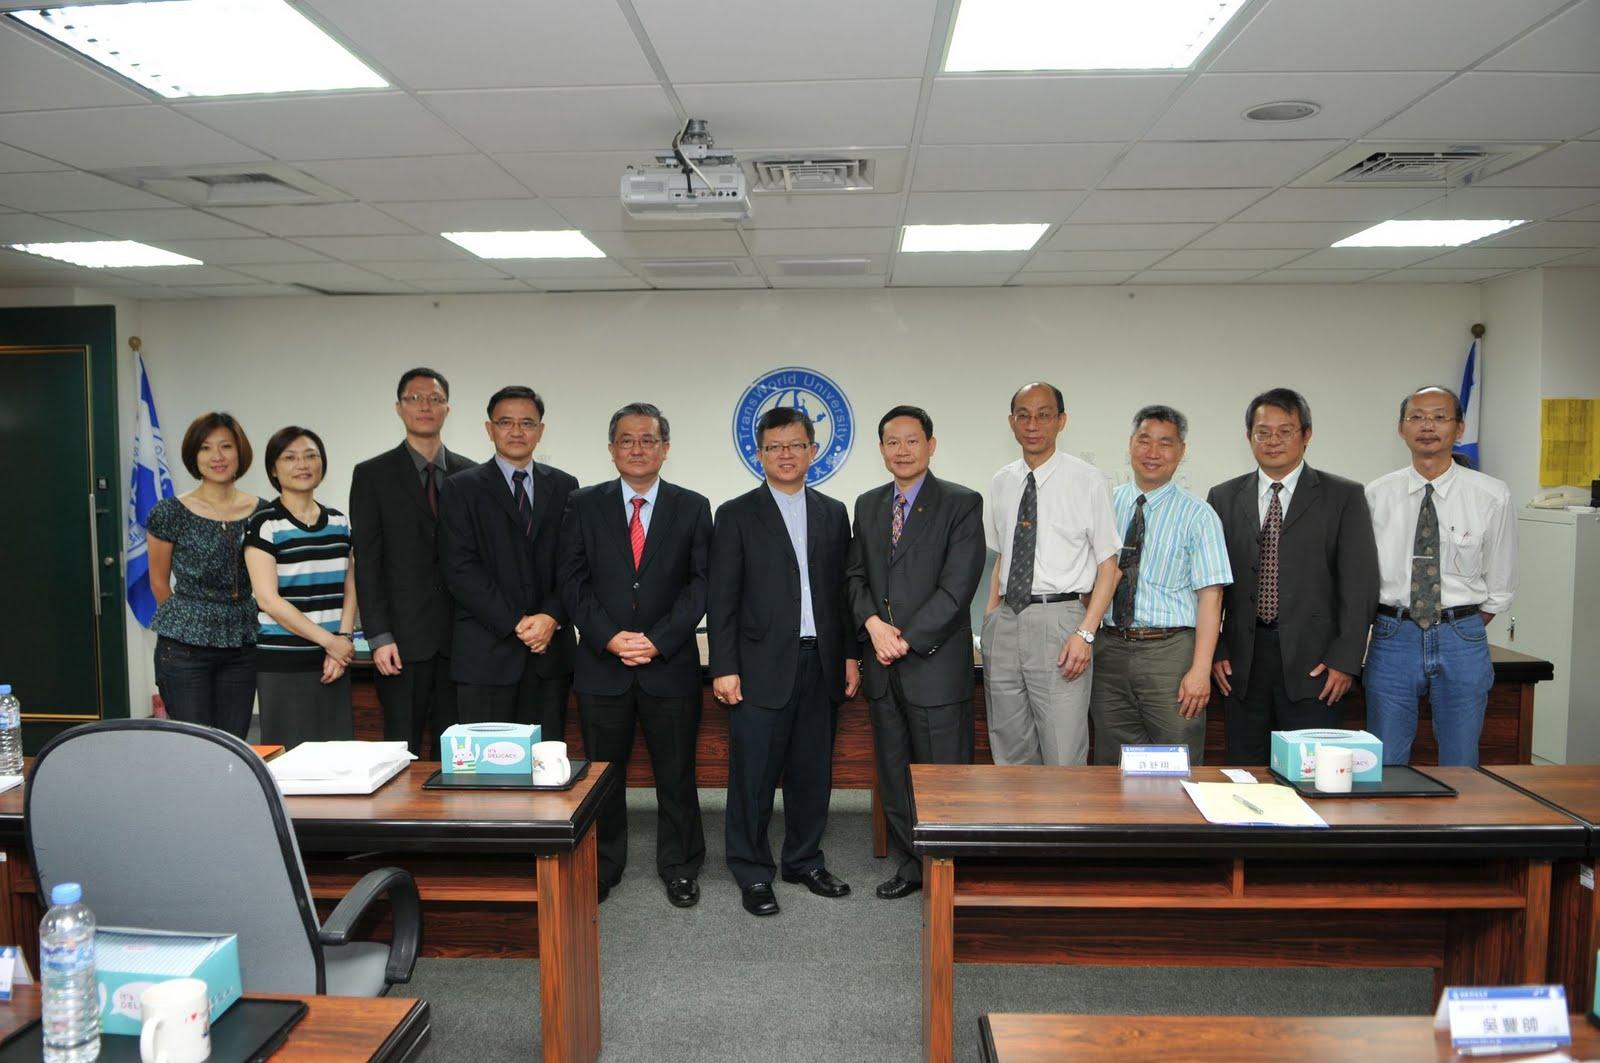 Office of International and Cross-Strait Affairs, Transworld University: 賀!馬來西亞拉曼學院與本校簽署雙聯技職教育合作計畫